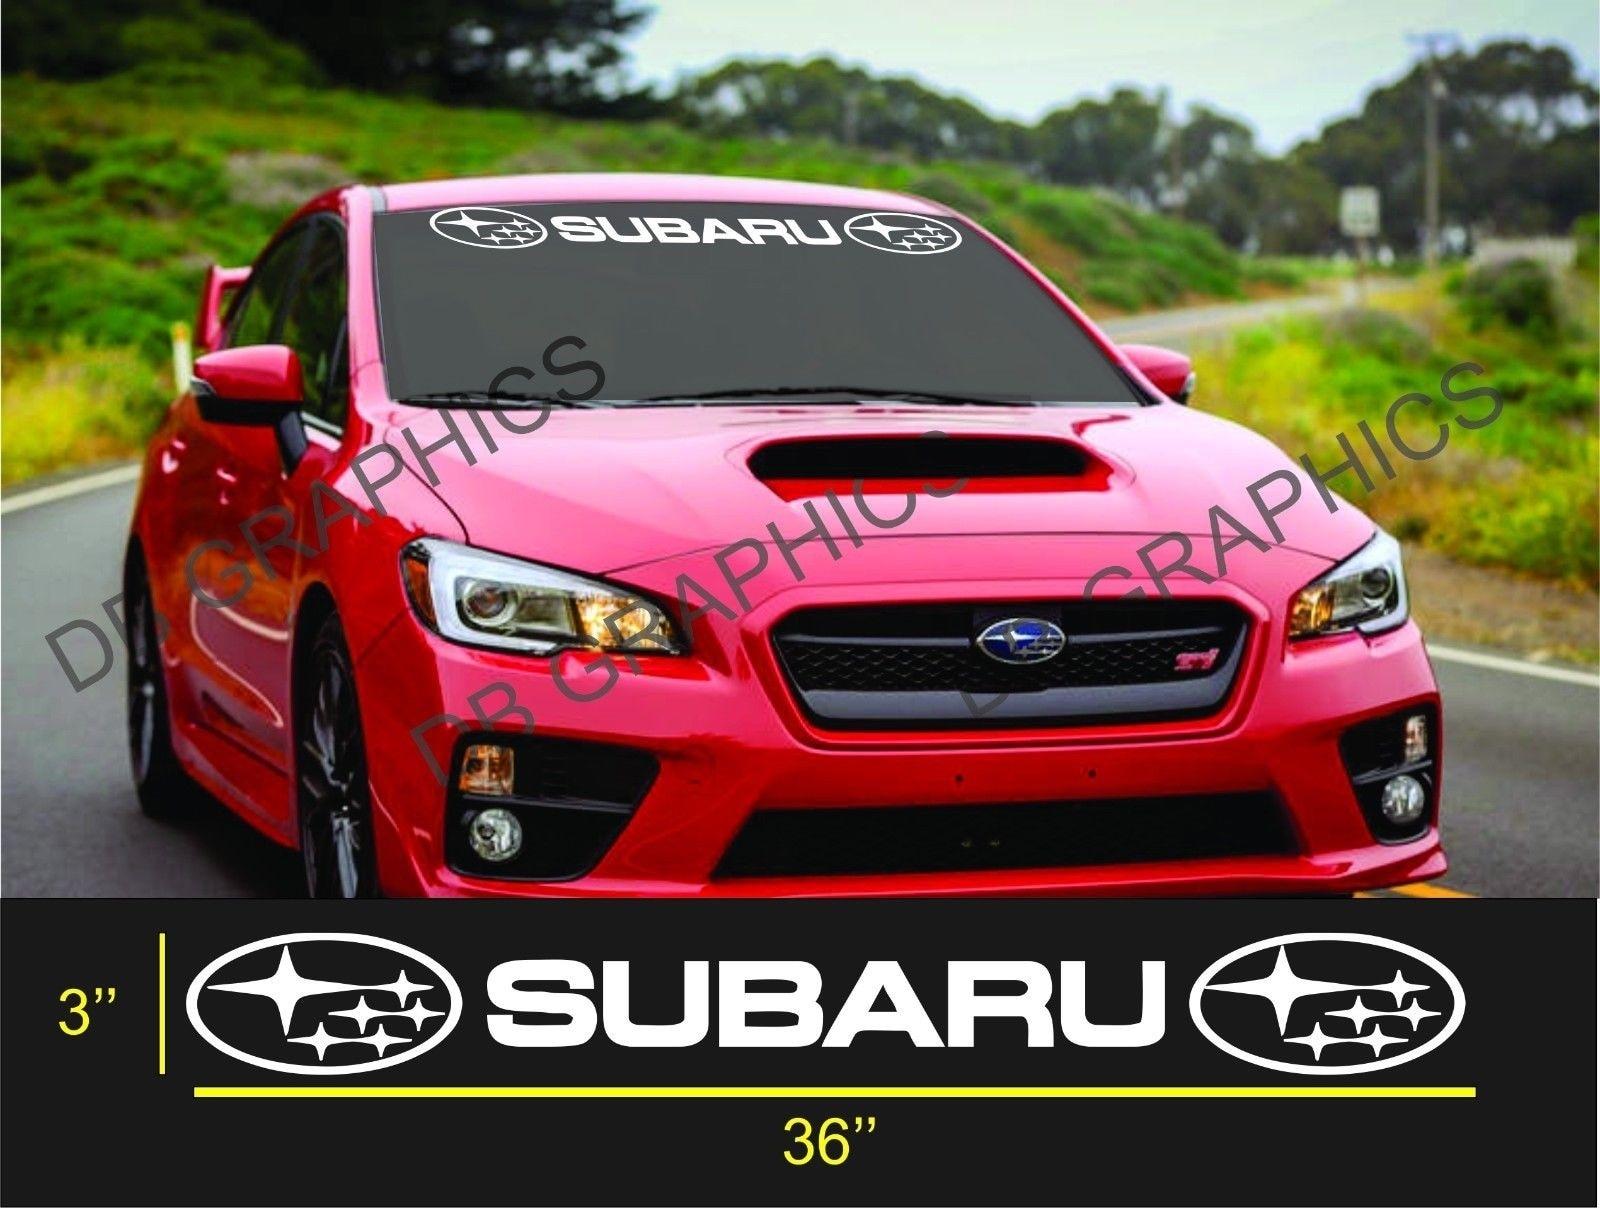 For subaru windshield sticker banner decal vinyl rally window graphic wrx custom sti